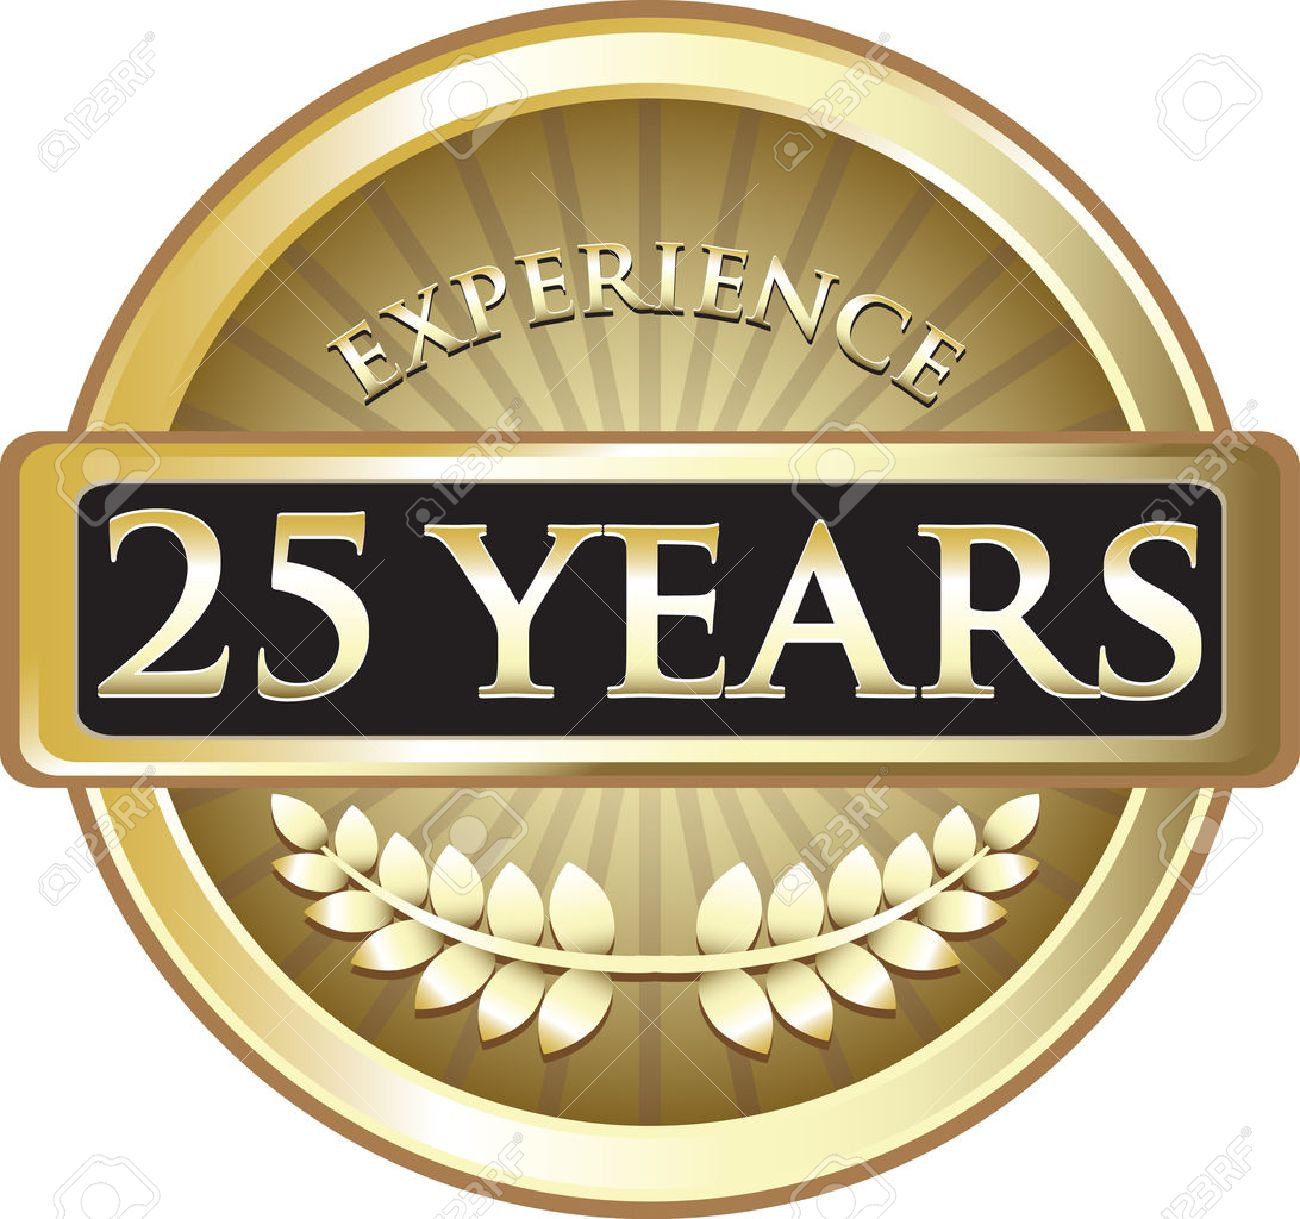 Twenty Five Years Experience Gold Award Stock Vector - 22300759